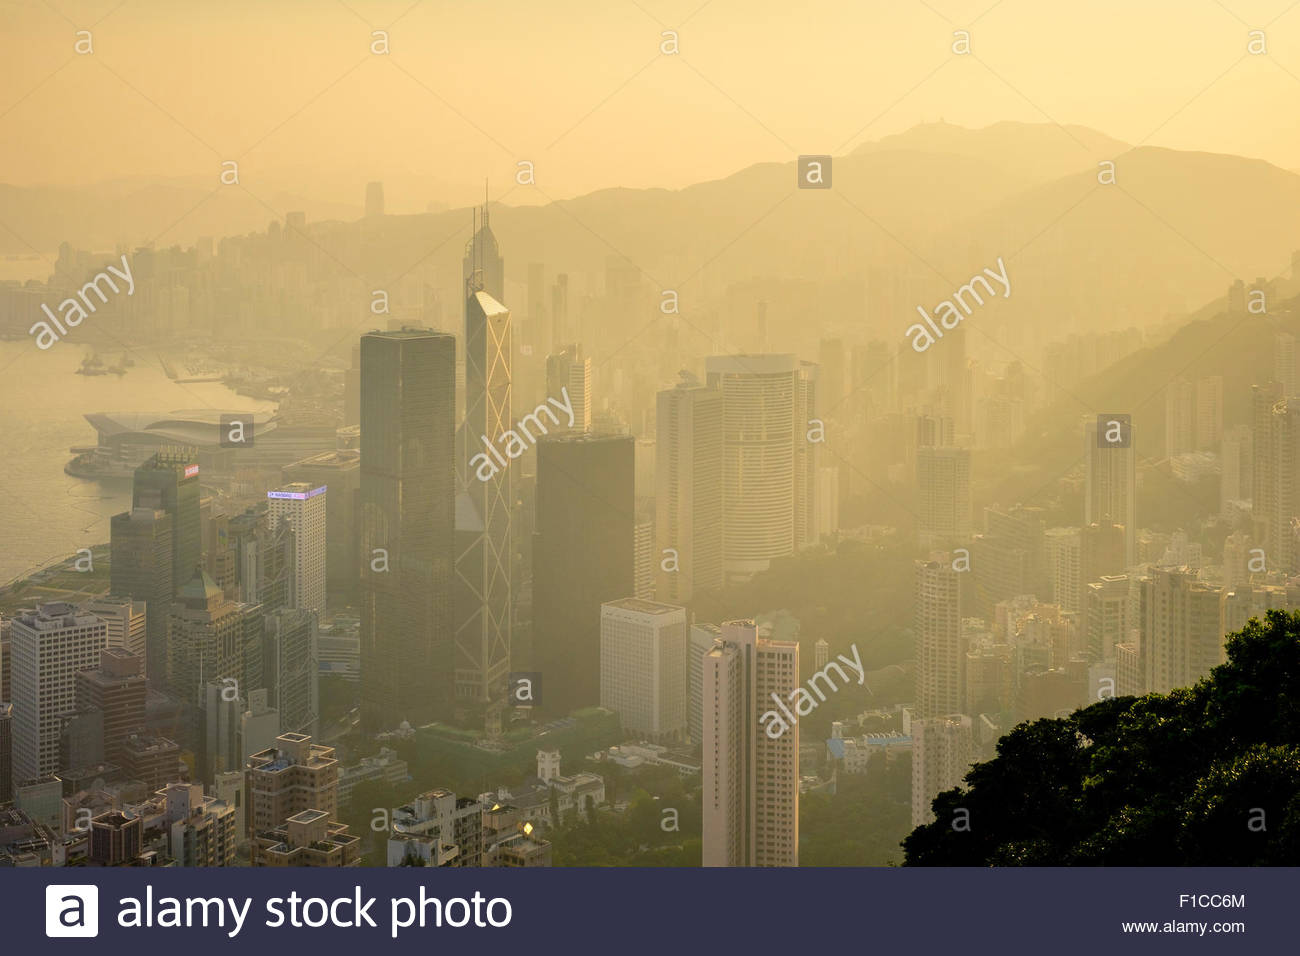 Skyscrapers in central Hong Kong, Admiralty and Mong Kok seen from The Peak at sunrise, Hong Kong Island, Hong Kong, - Stock Image